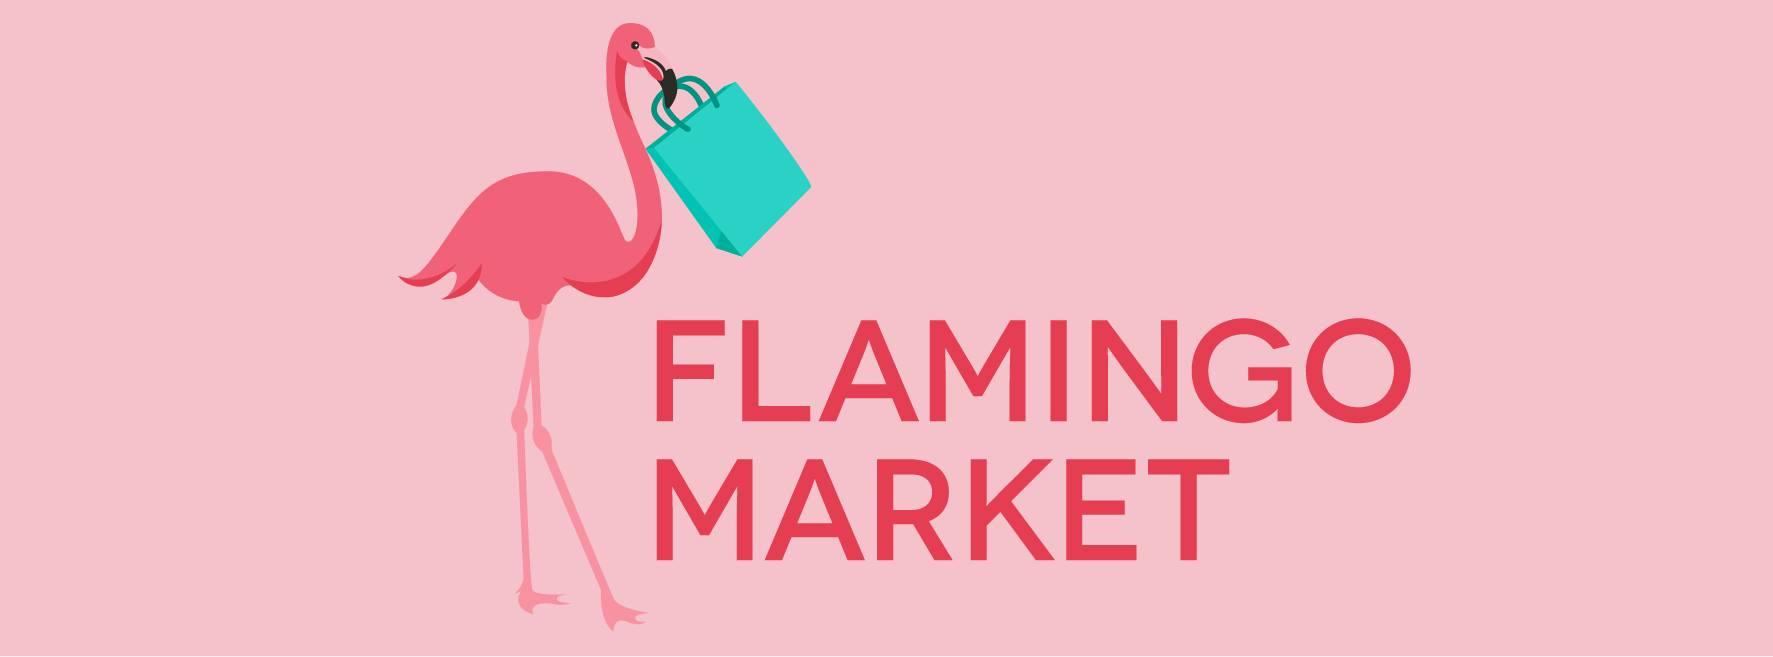 flamingo-market